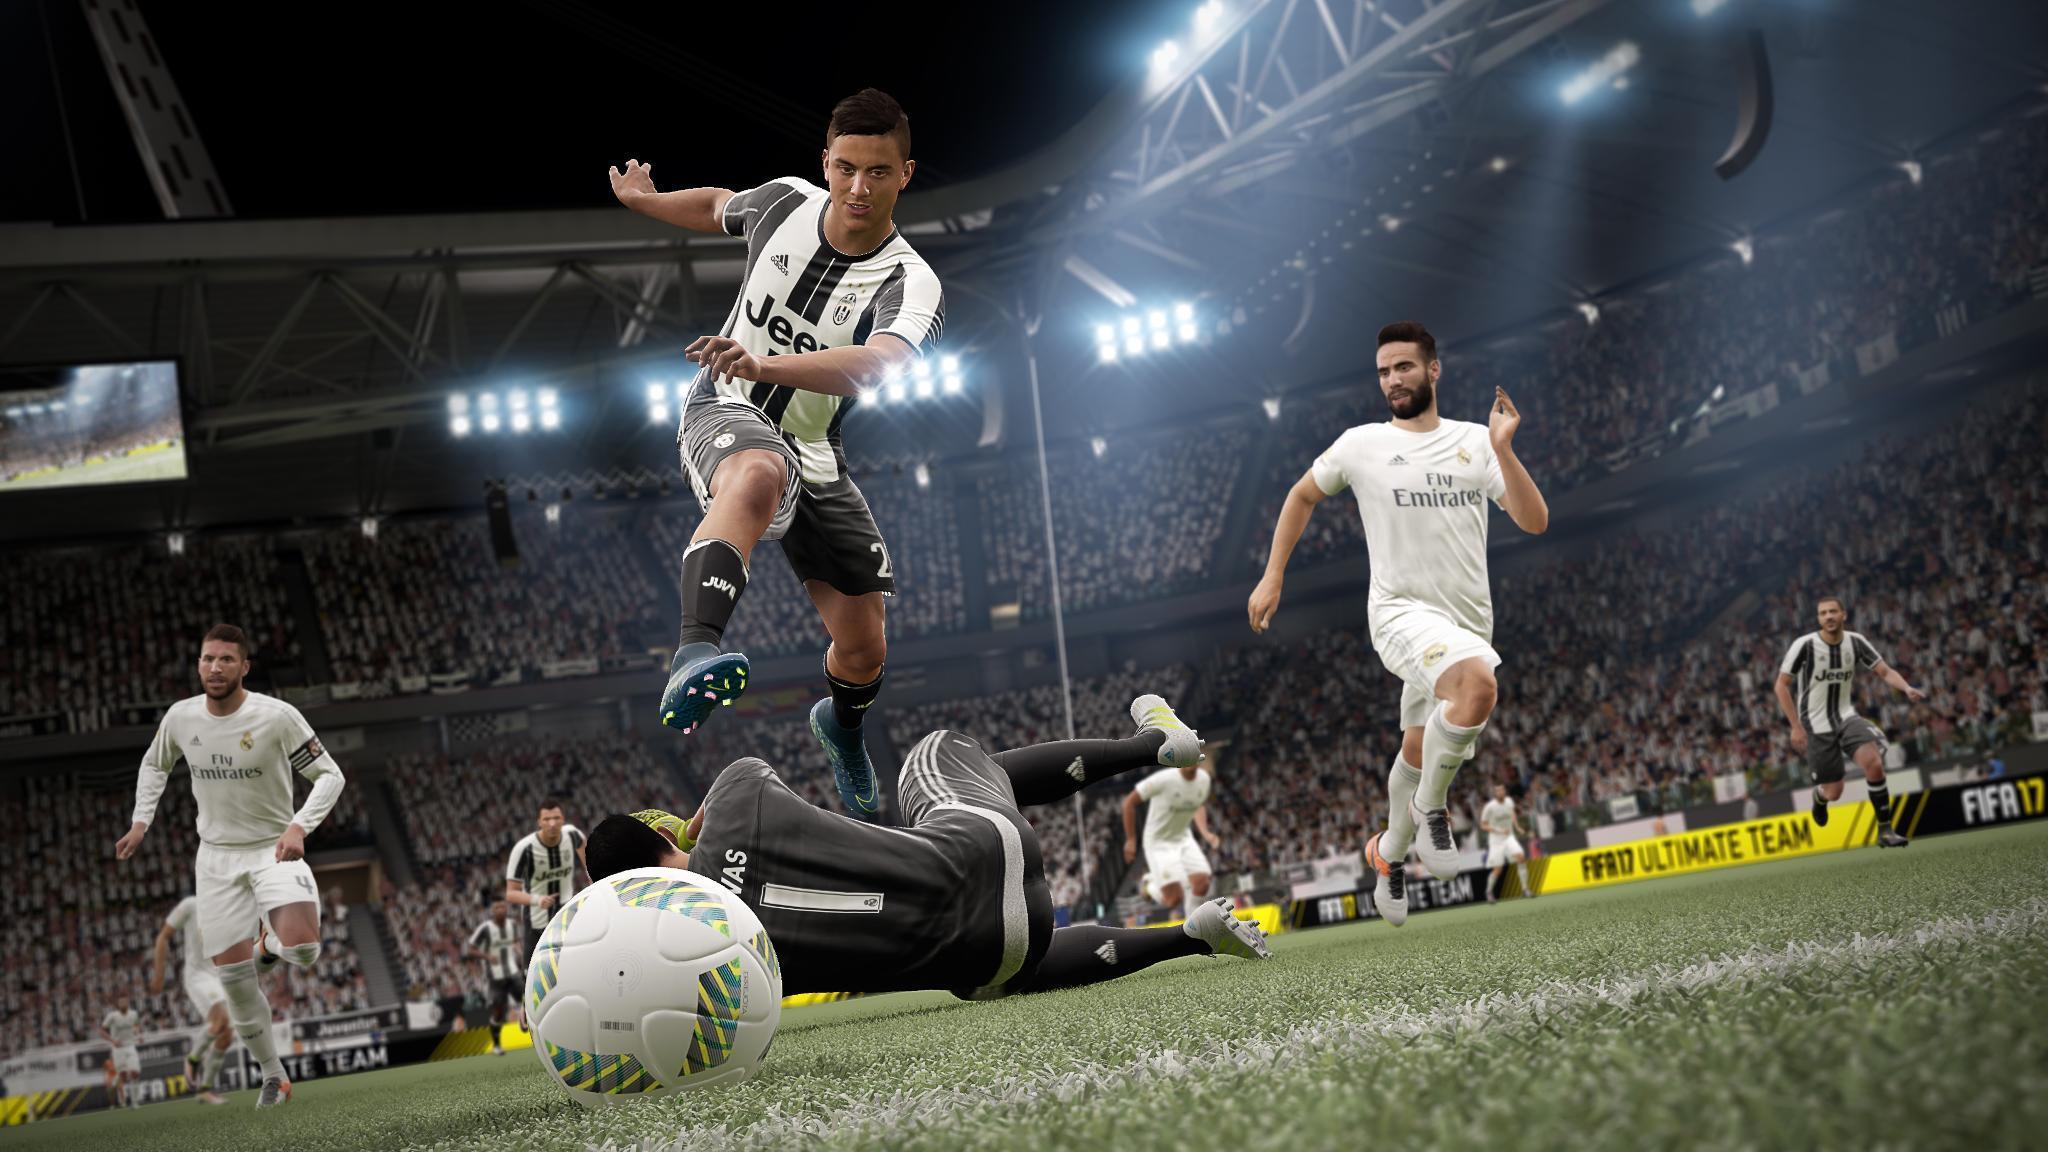 EA修复FIFA 16隐藏数值弱化